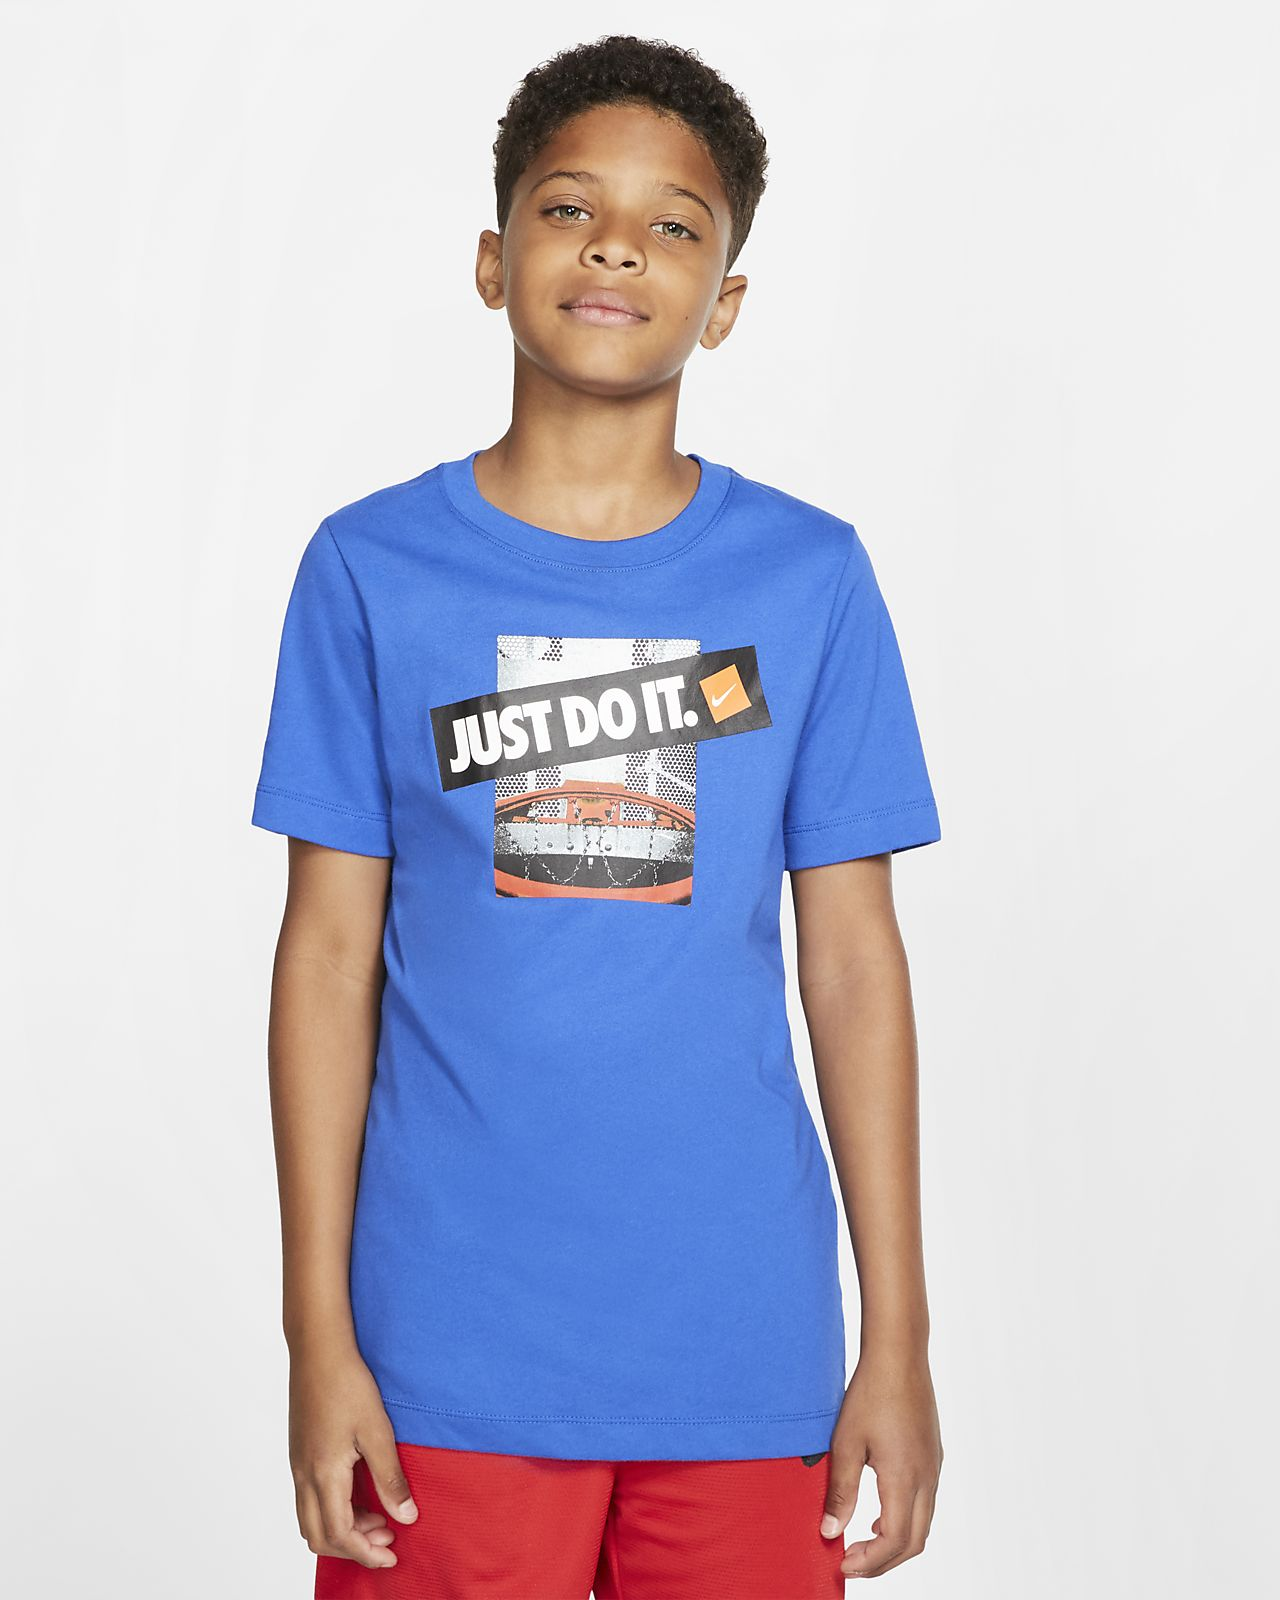 T-Shirt μπάσκετ Nike Dri-FIT για μεγάλα παιδιά